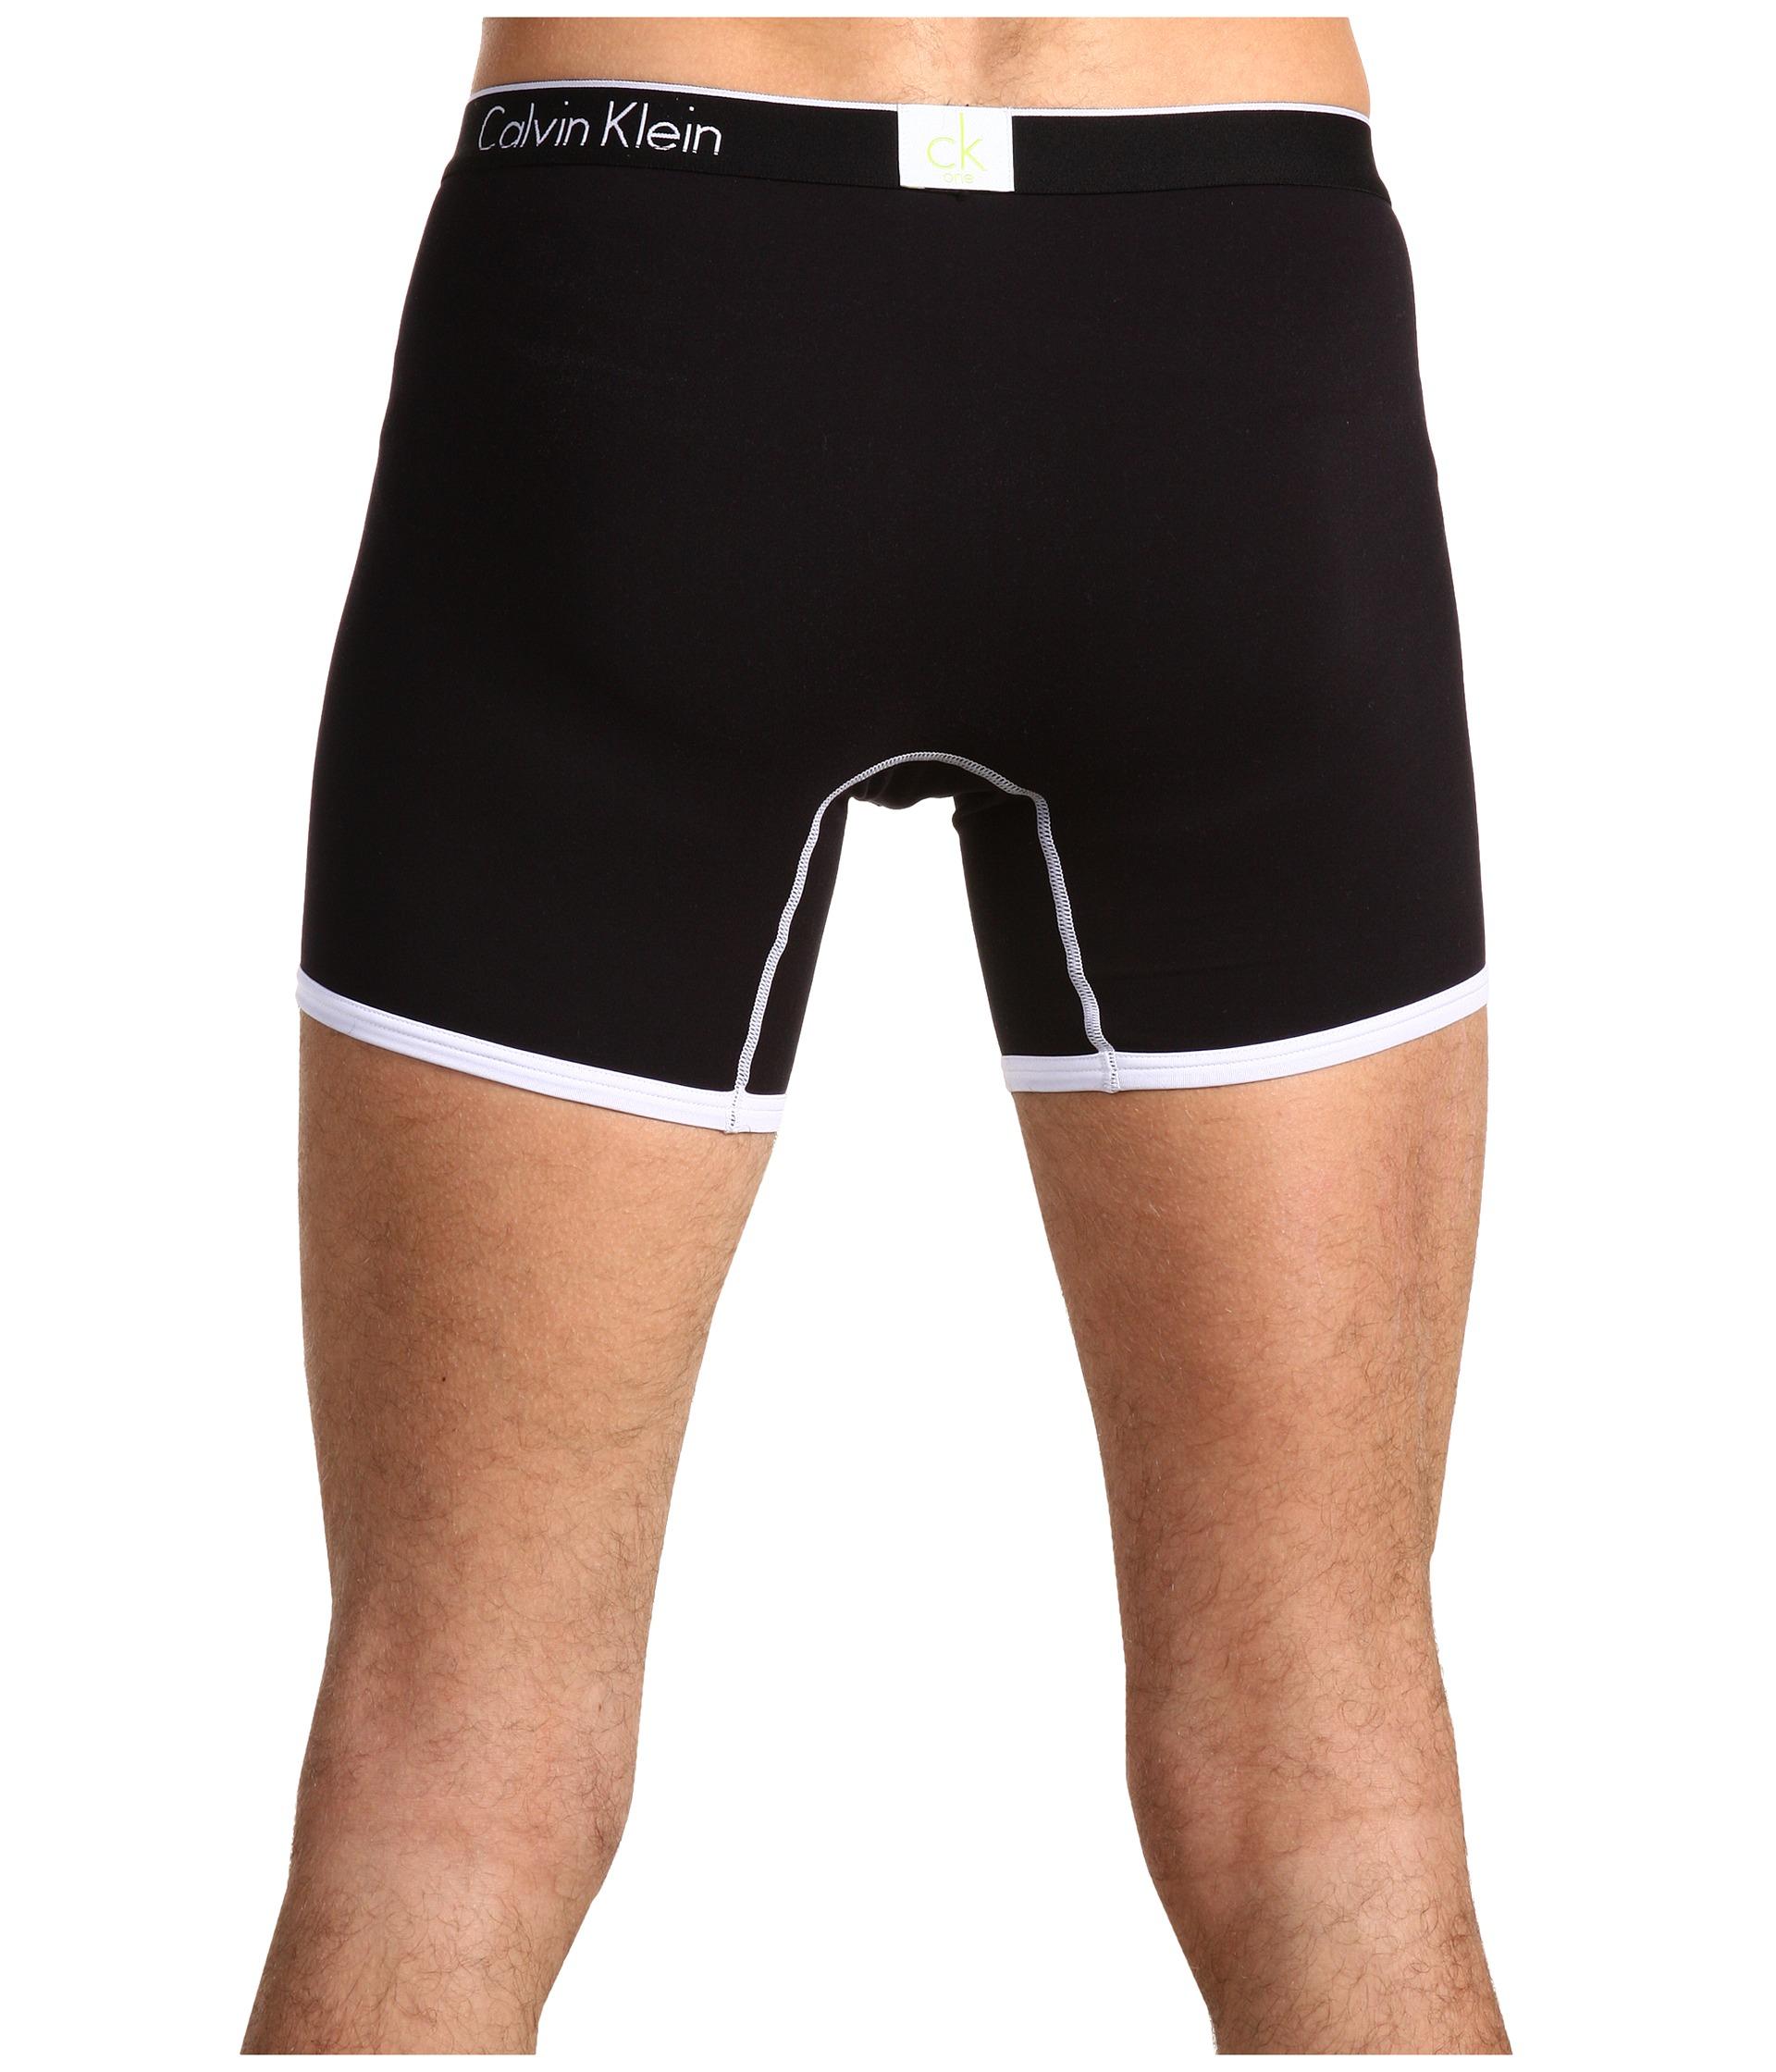 565e64788b4b Lyst - Calvin Klein Ck One Microfiber Boxer Brief in Black for Men